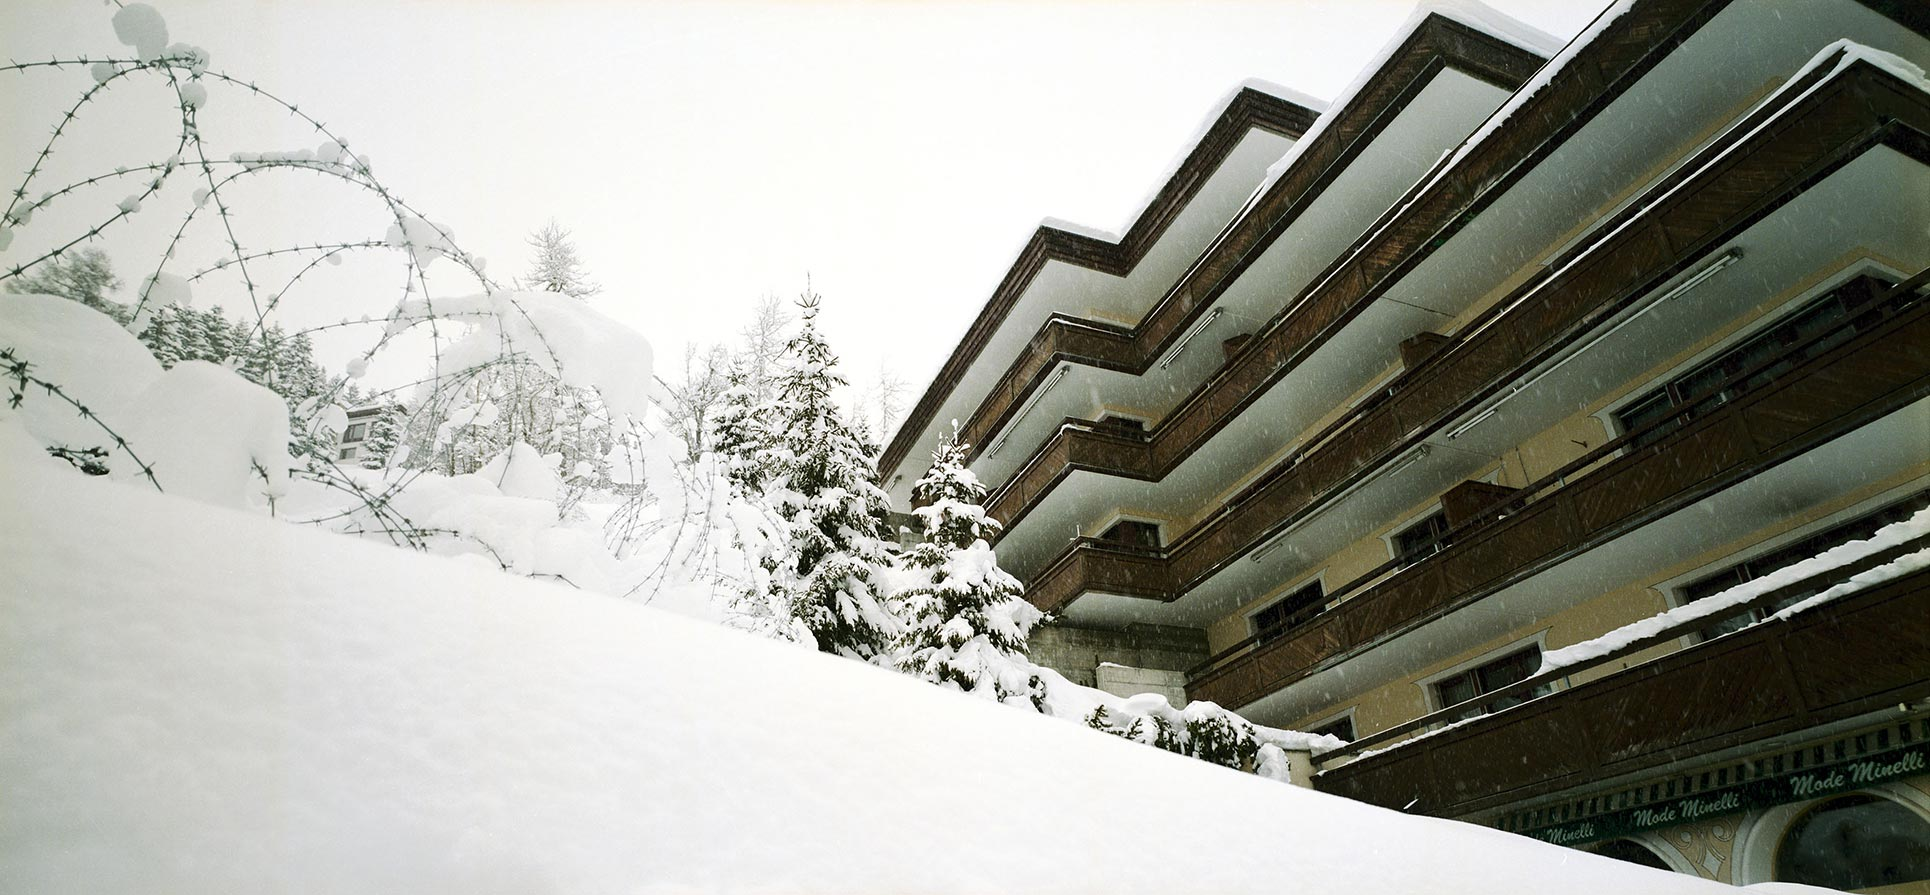 Armin Linke, World Economic Forum, Davos Switzerland, 2005